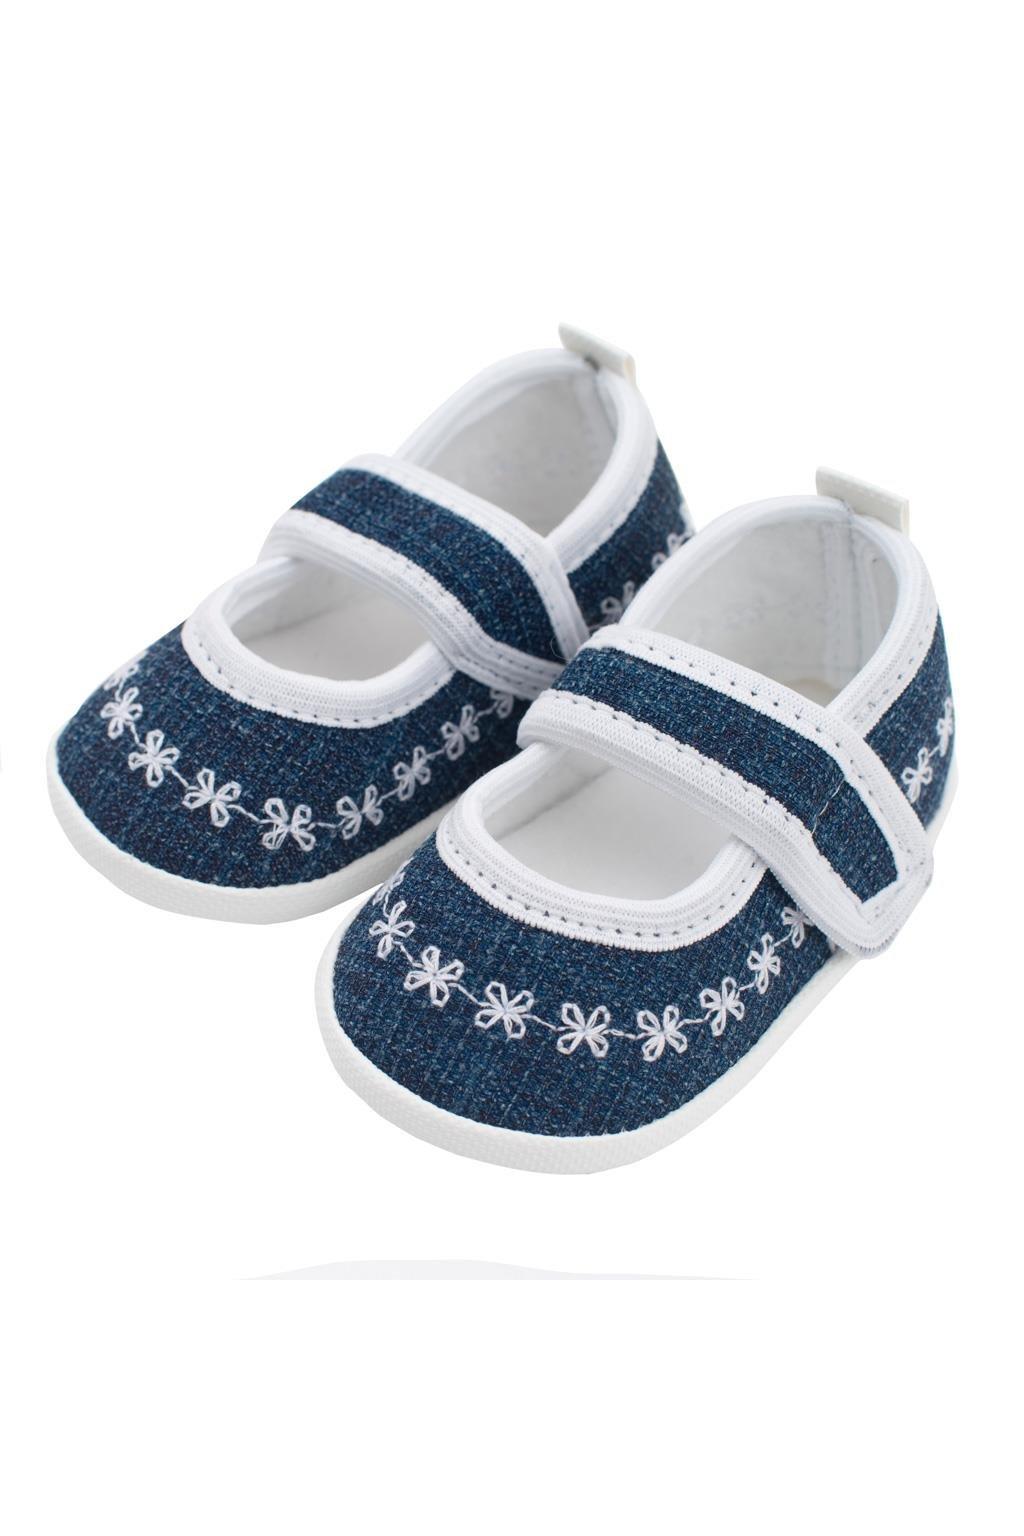 Dojčenské capačky New Baby Jeans biele 0-3 m